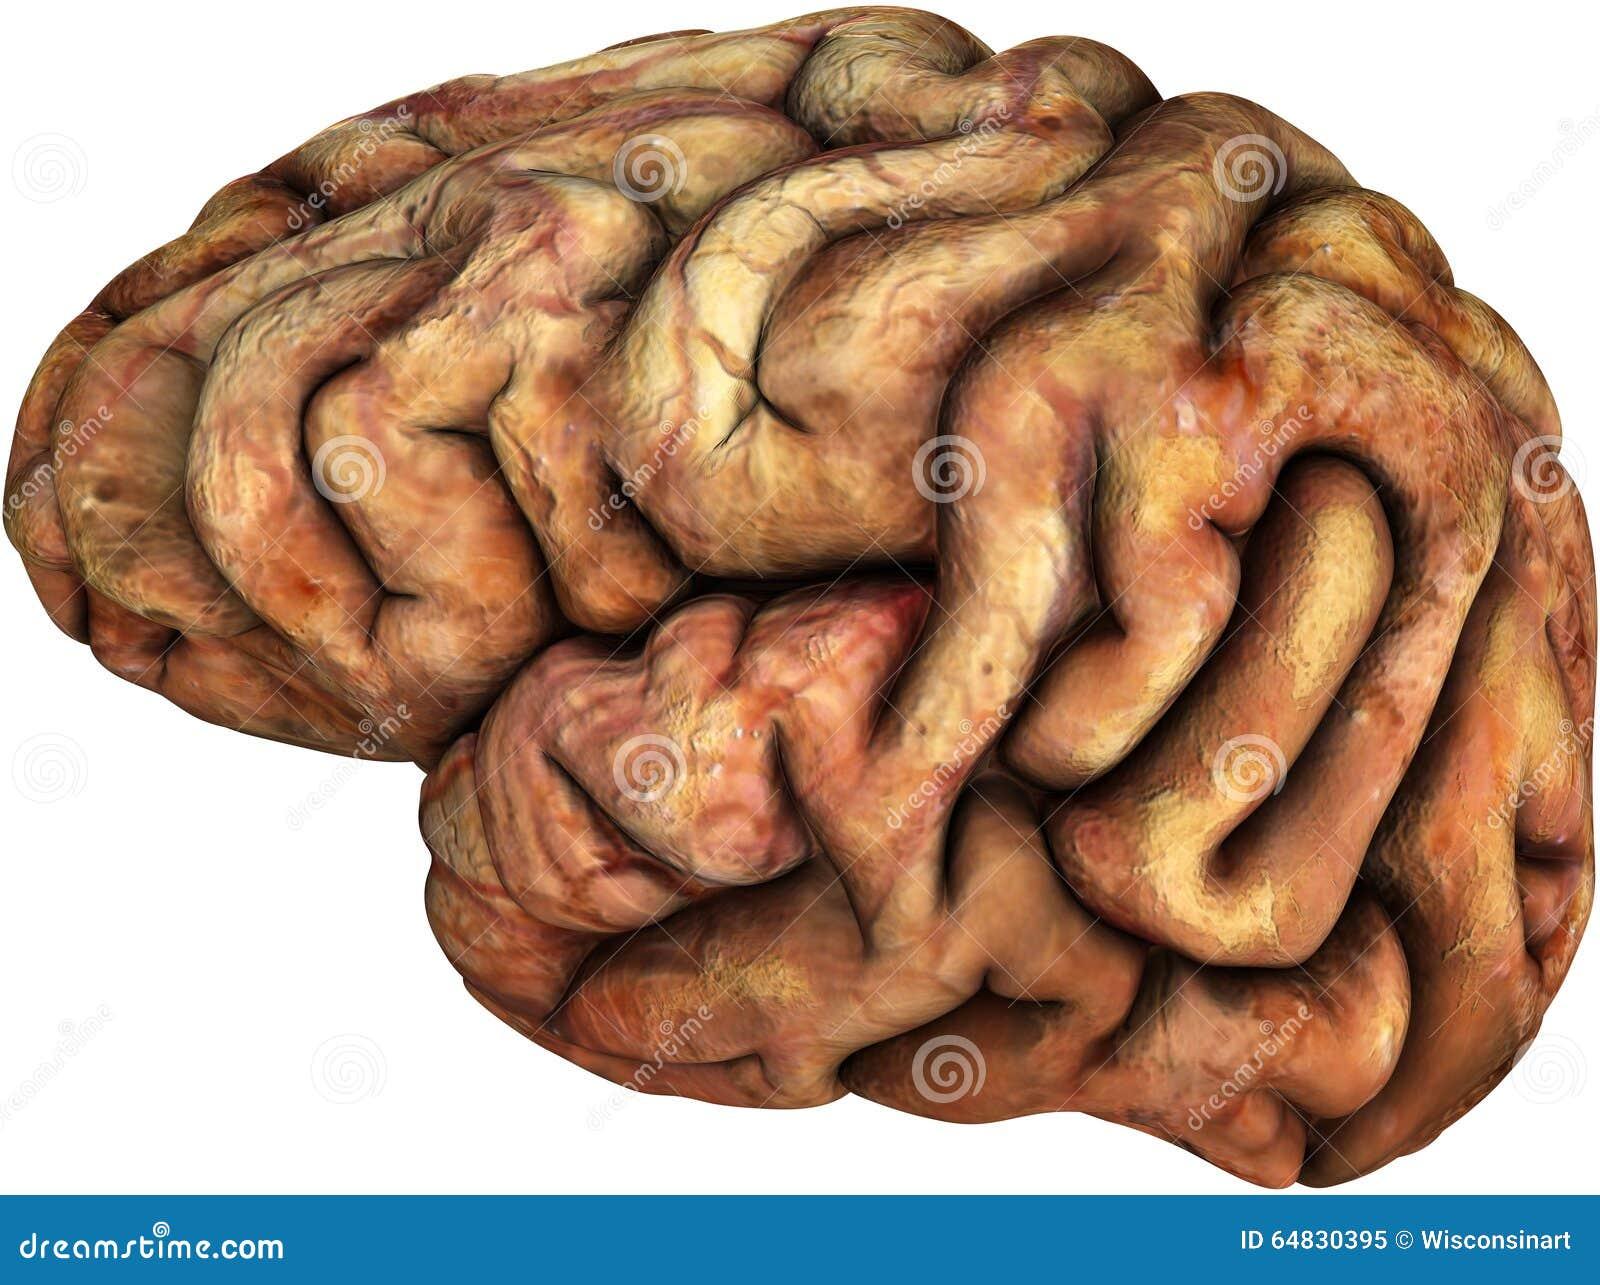 Human Brain Illustration Isolated Body Parts Stock Image